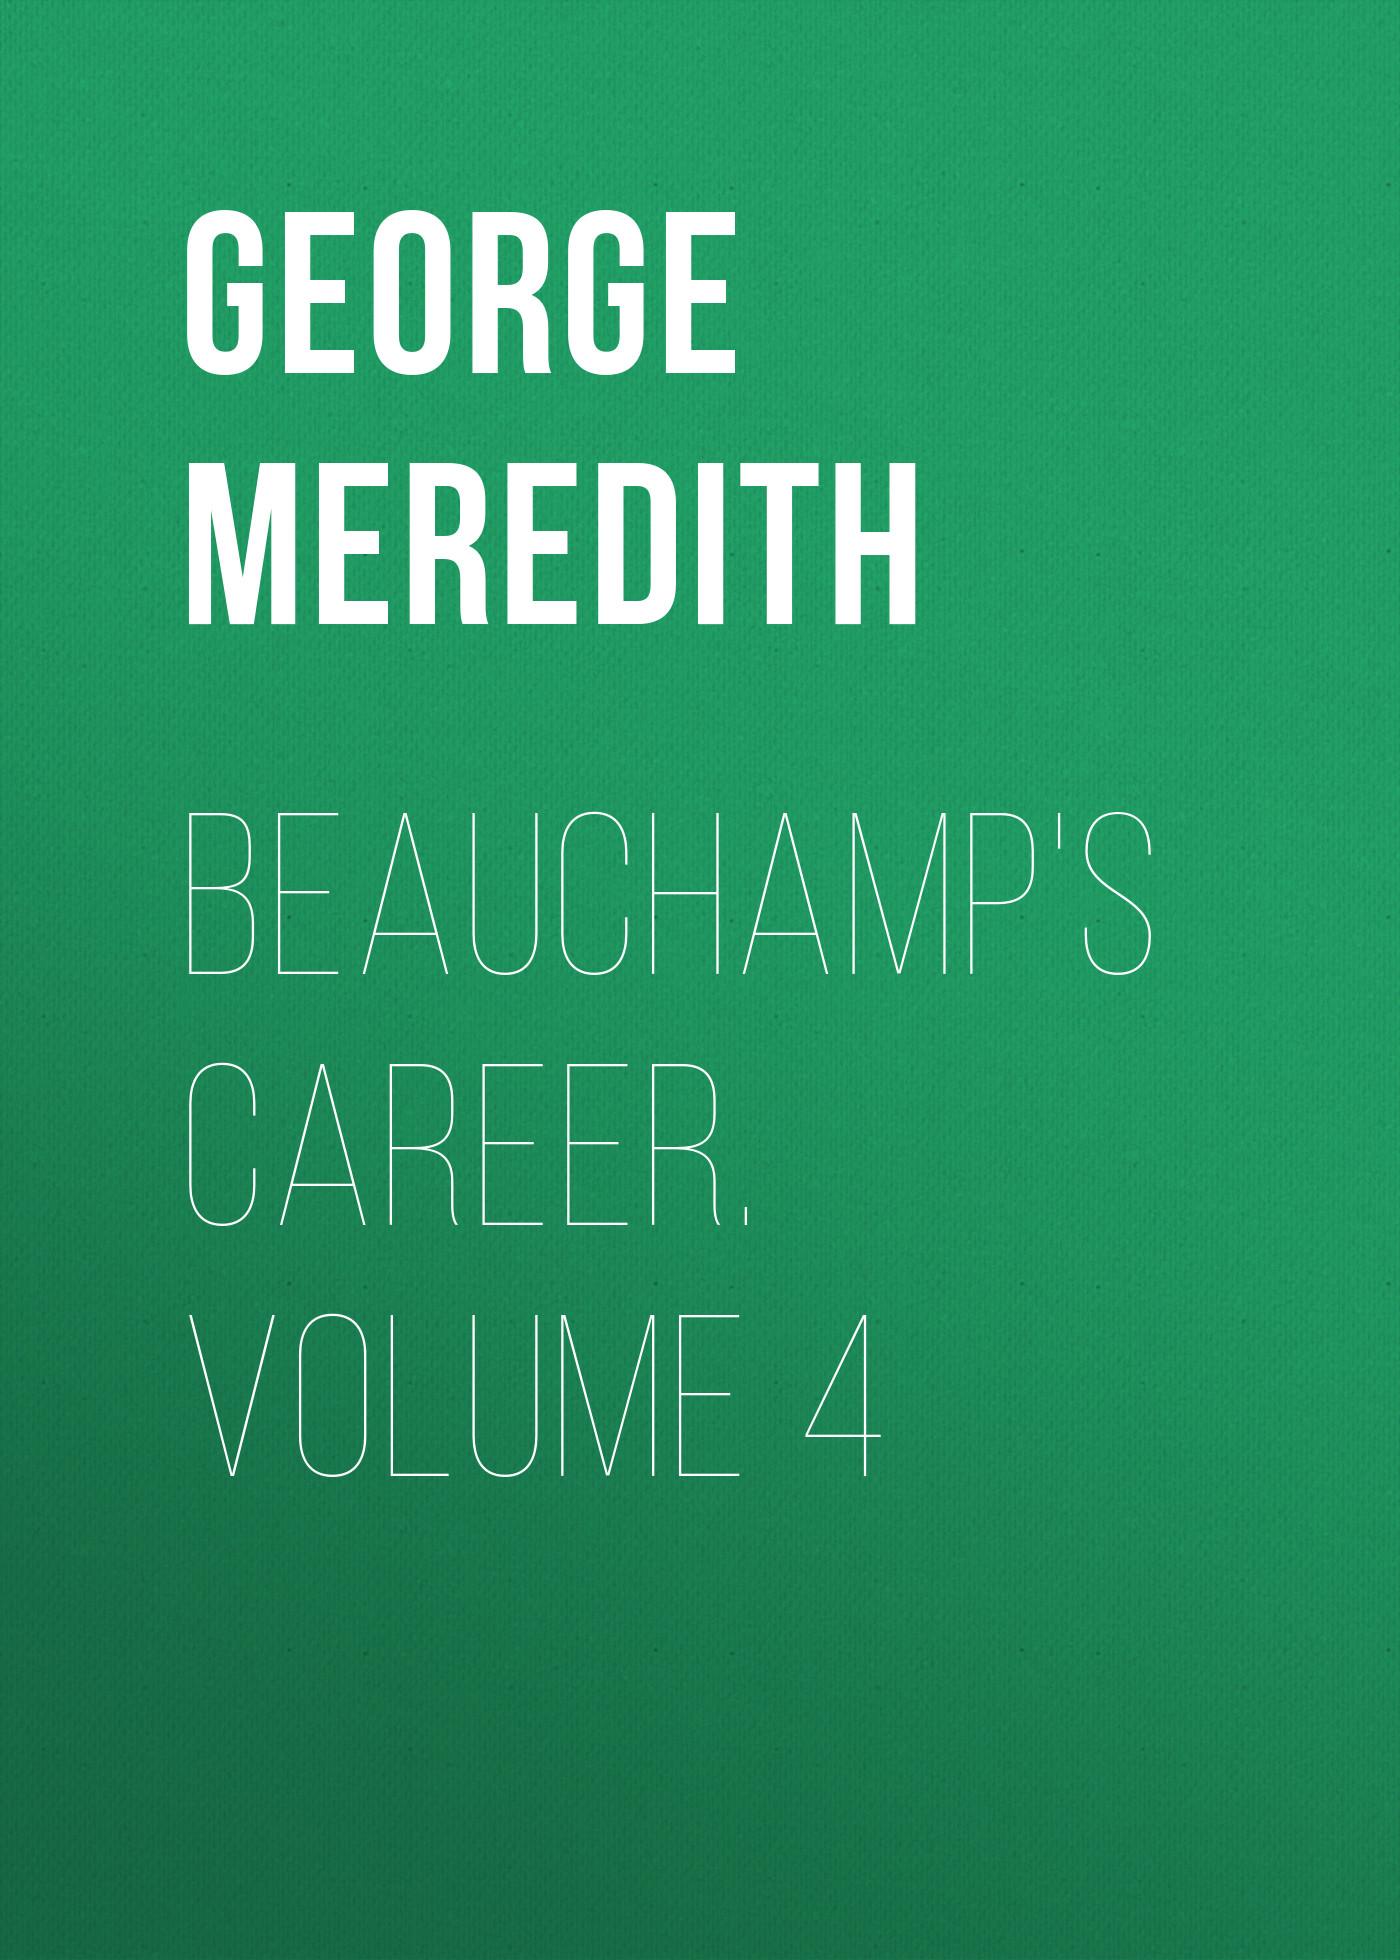 George Meredith Beauchamp's Career. Volume 4 gon volume 4